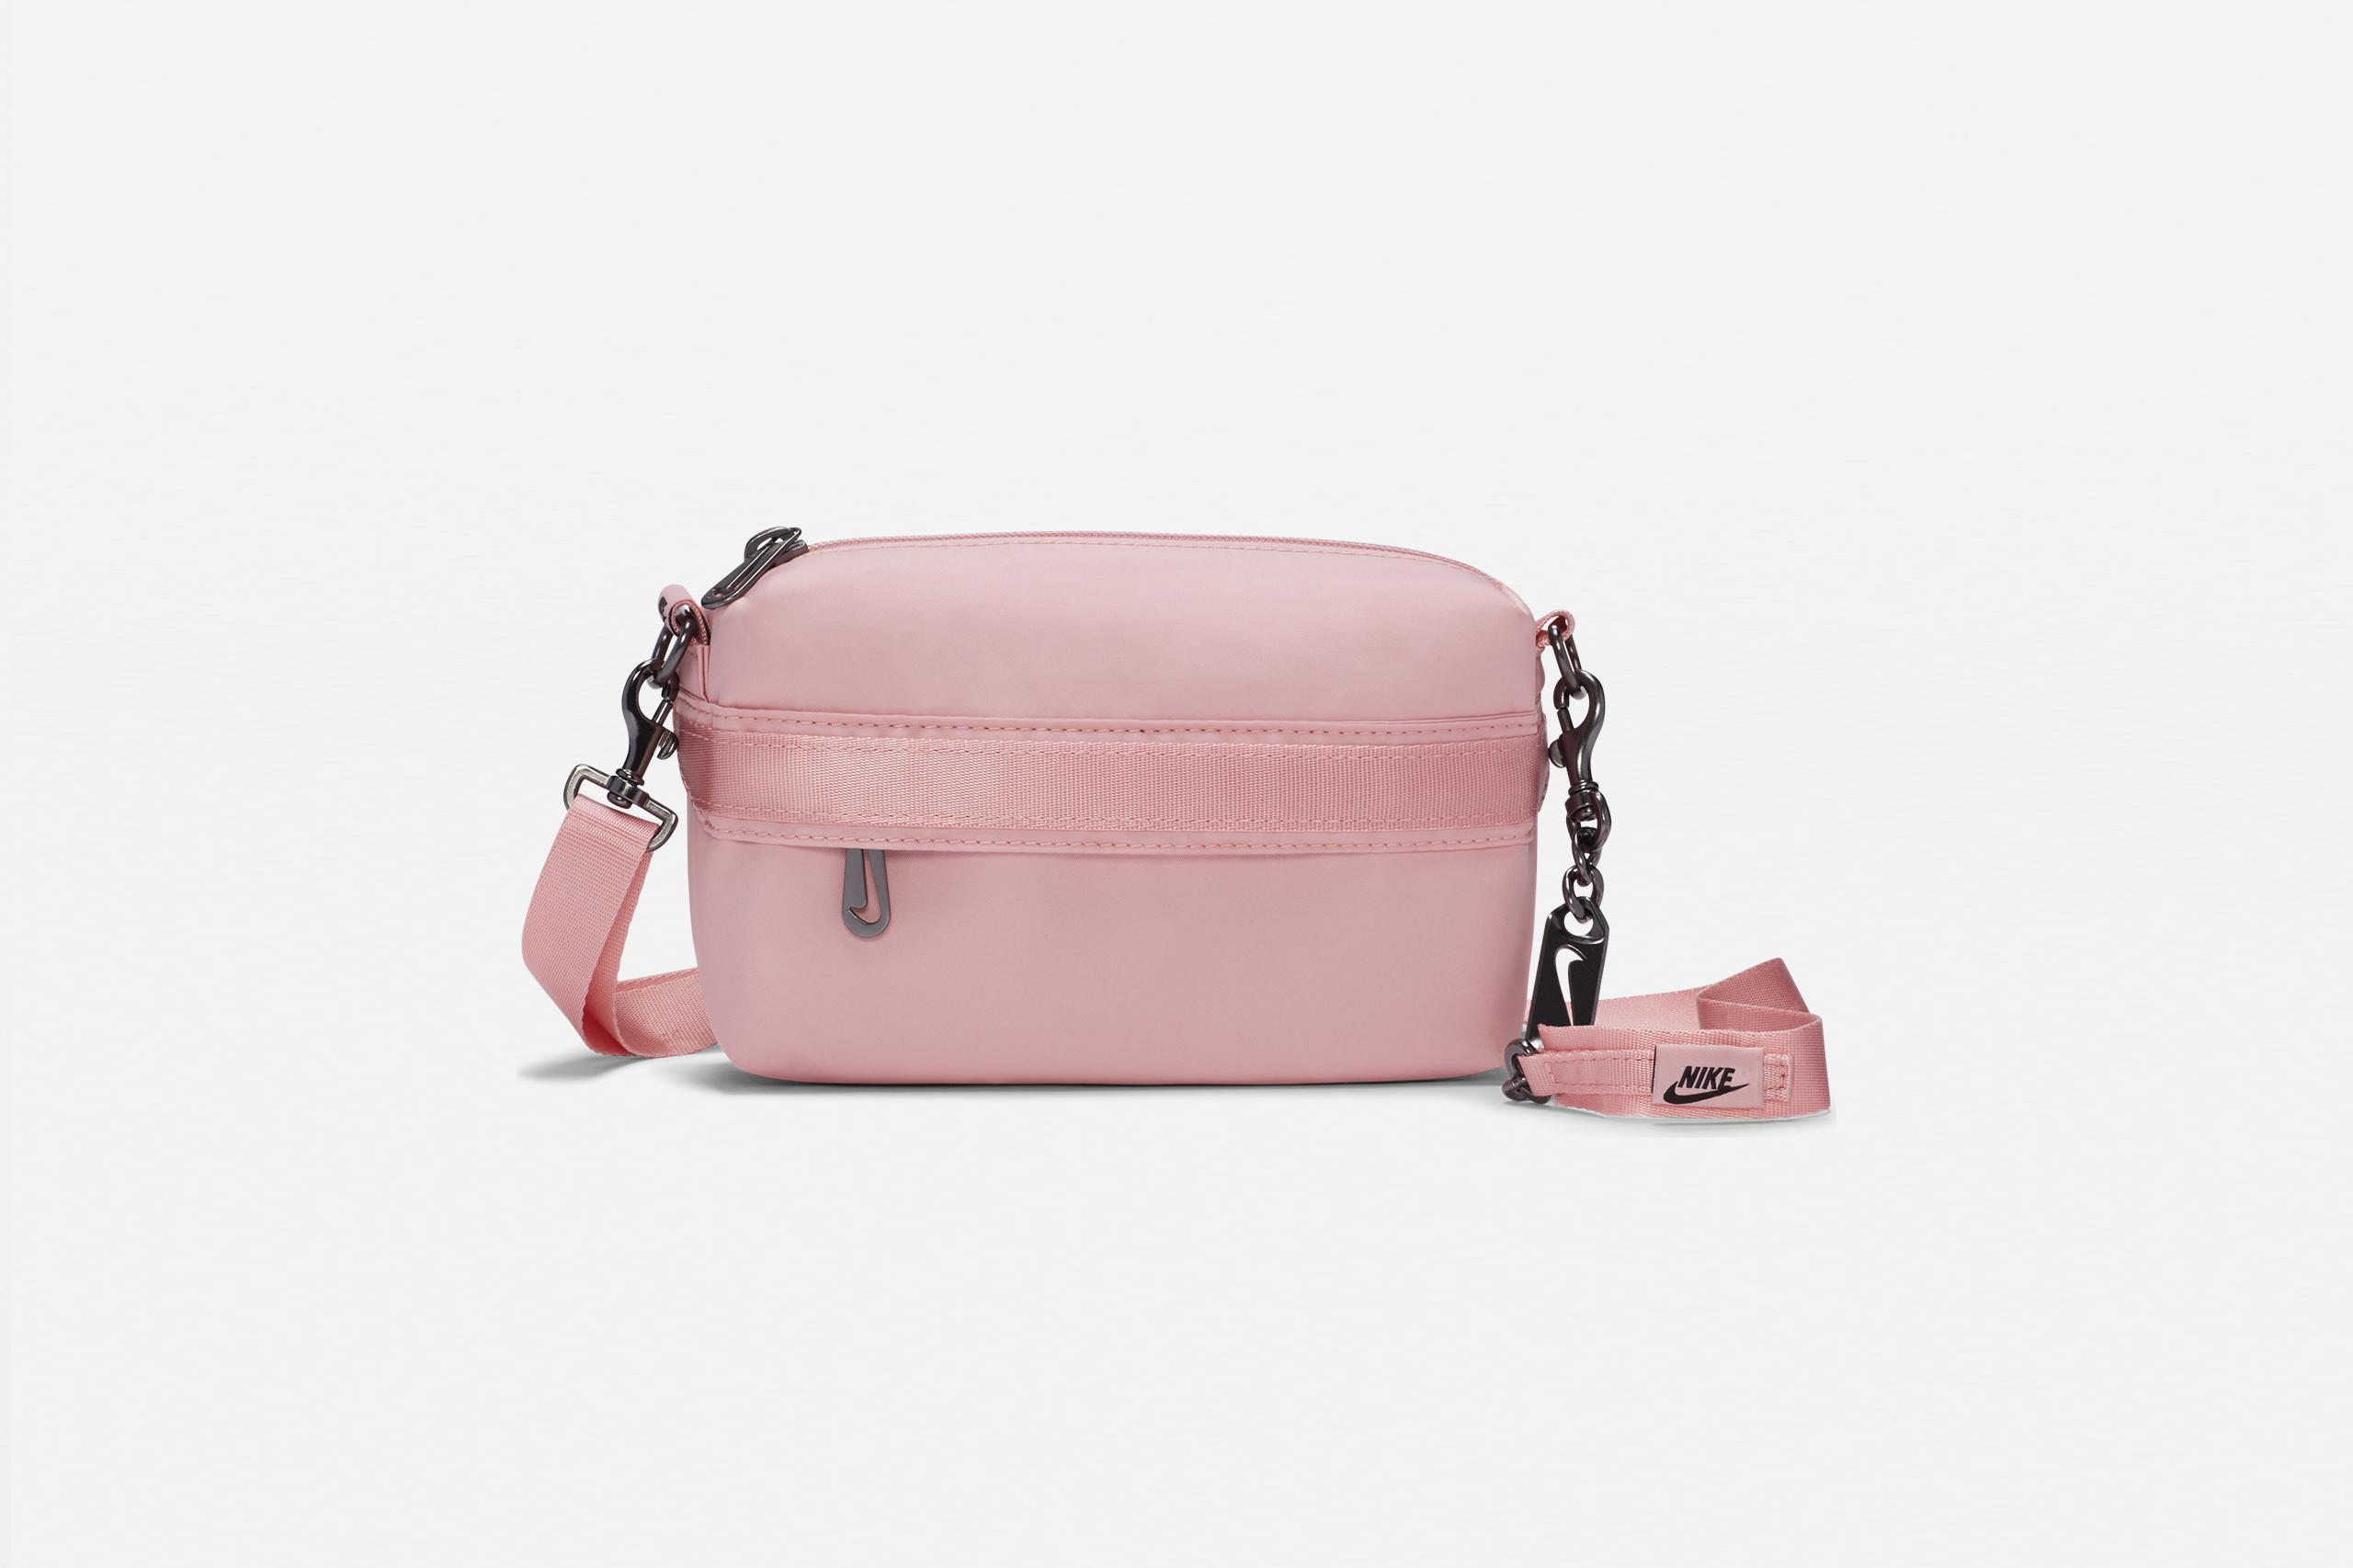 Nike Women's Futura Luxe Crossbody Pink Glaze/Black